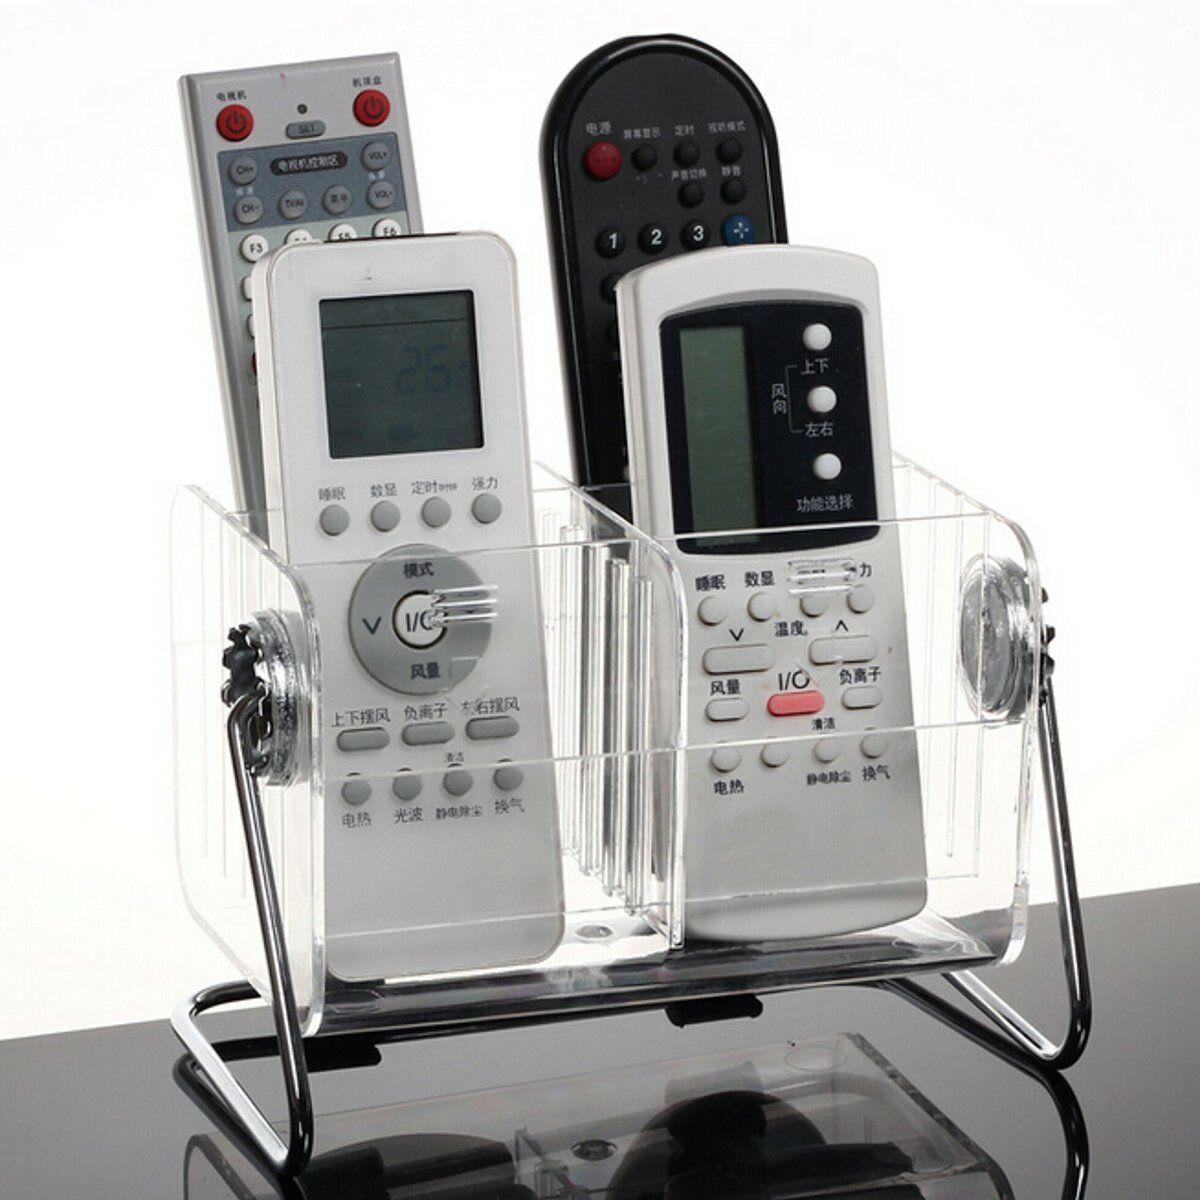 Desktop Clear TV Remote Control Mobile Phone Organizer Storage Box Stand Holder Transparent Case